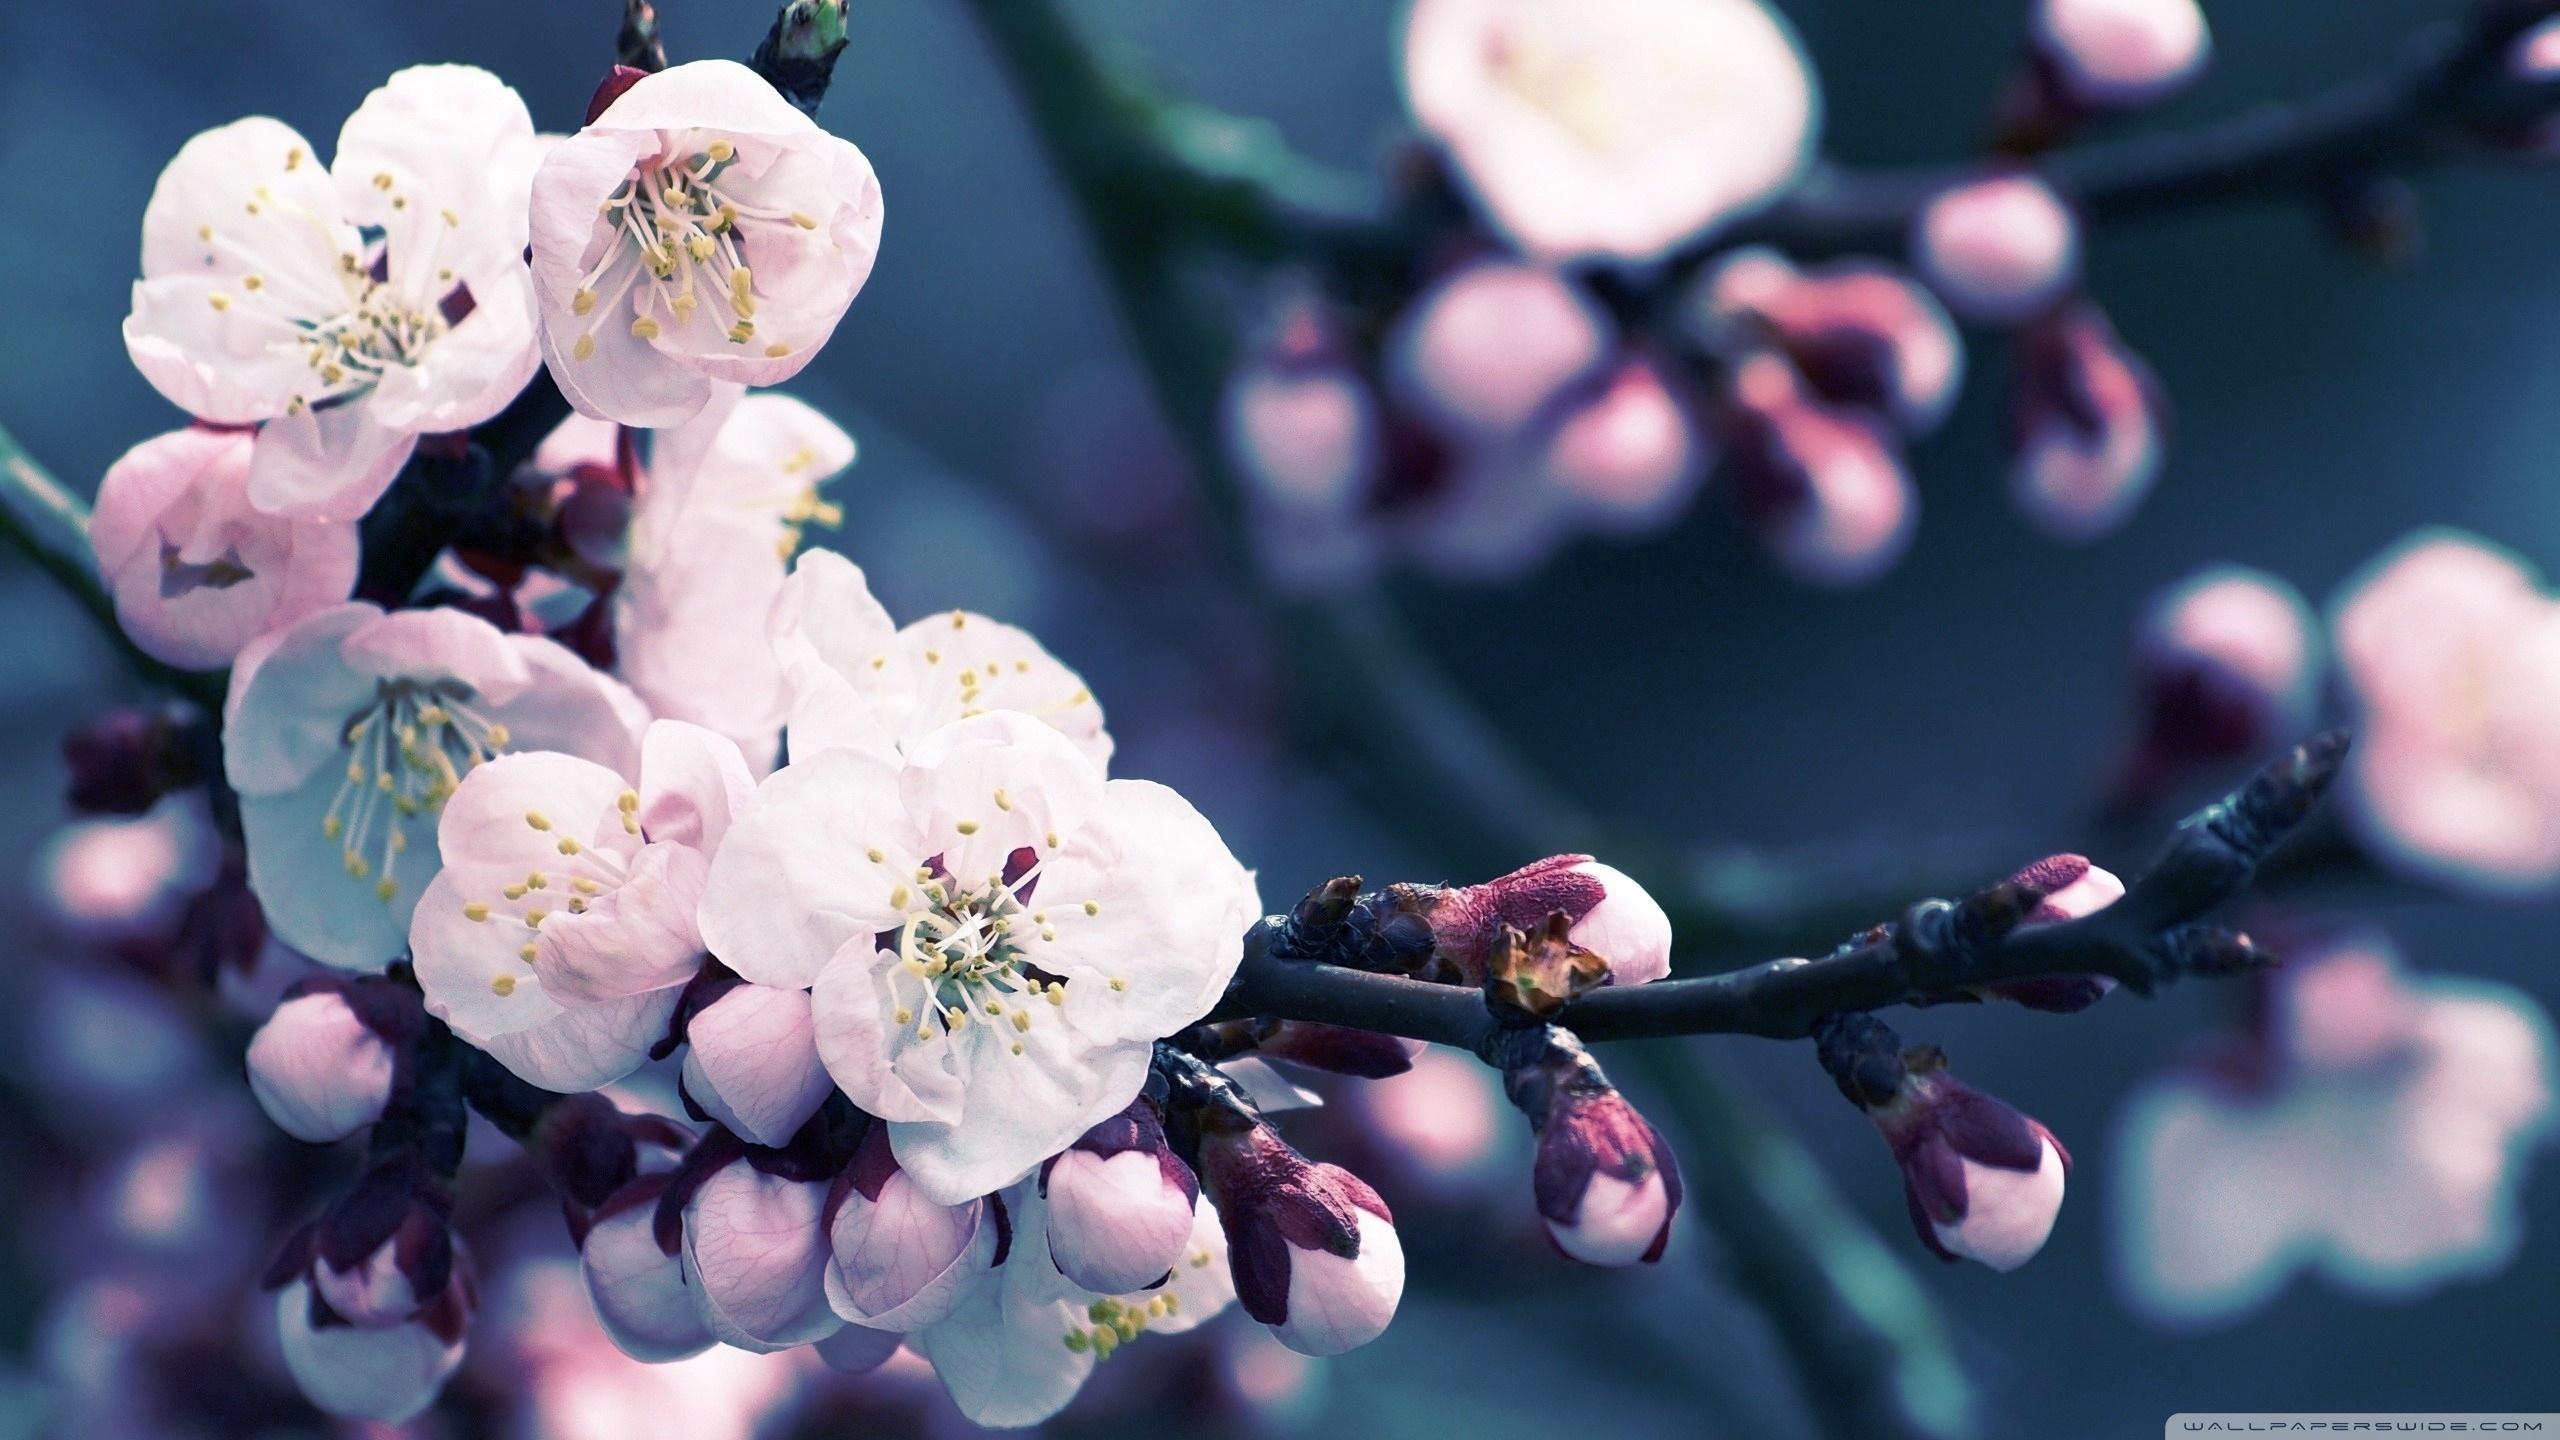 close up of cherry blossom ❤ 4k hd desktop wallpaper for 4k ultra